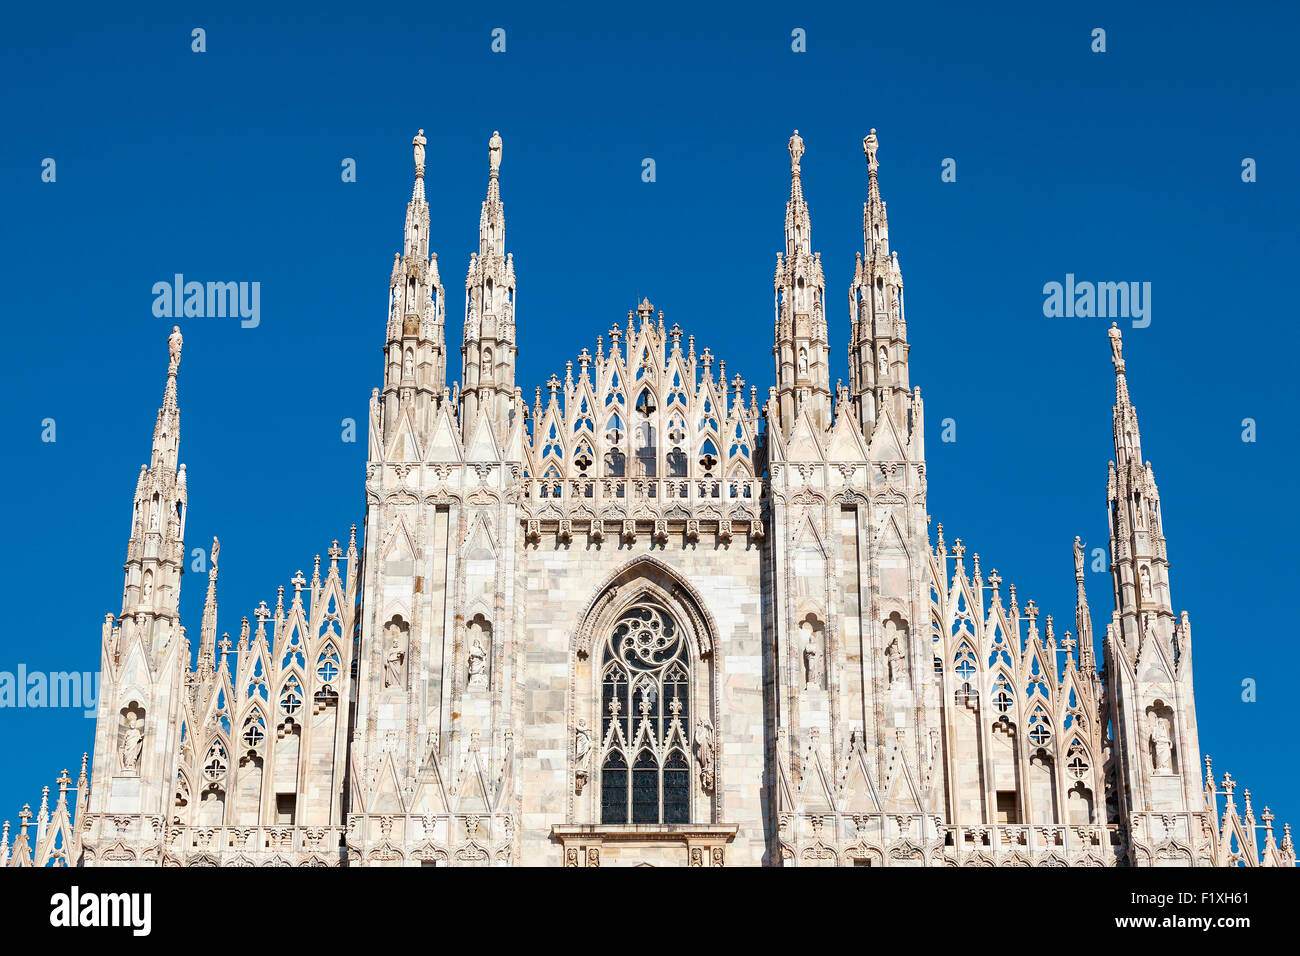 Milan Cathedral (Duomo di Milano) is the cathedral church of Milan, Italy. Dedicated to Santa Maria Nascente - Stock Image